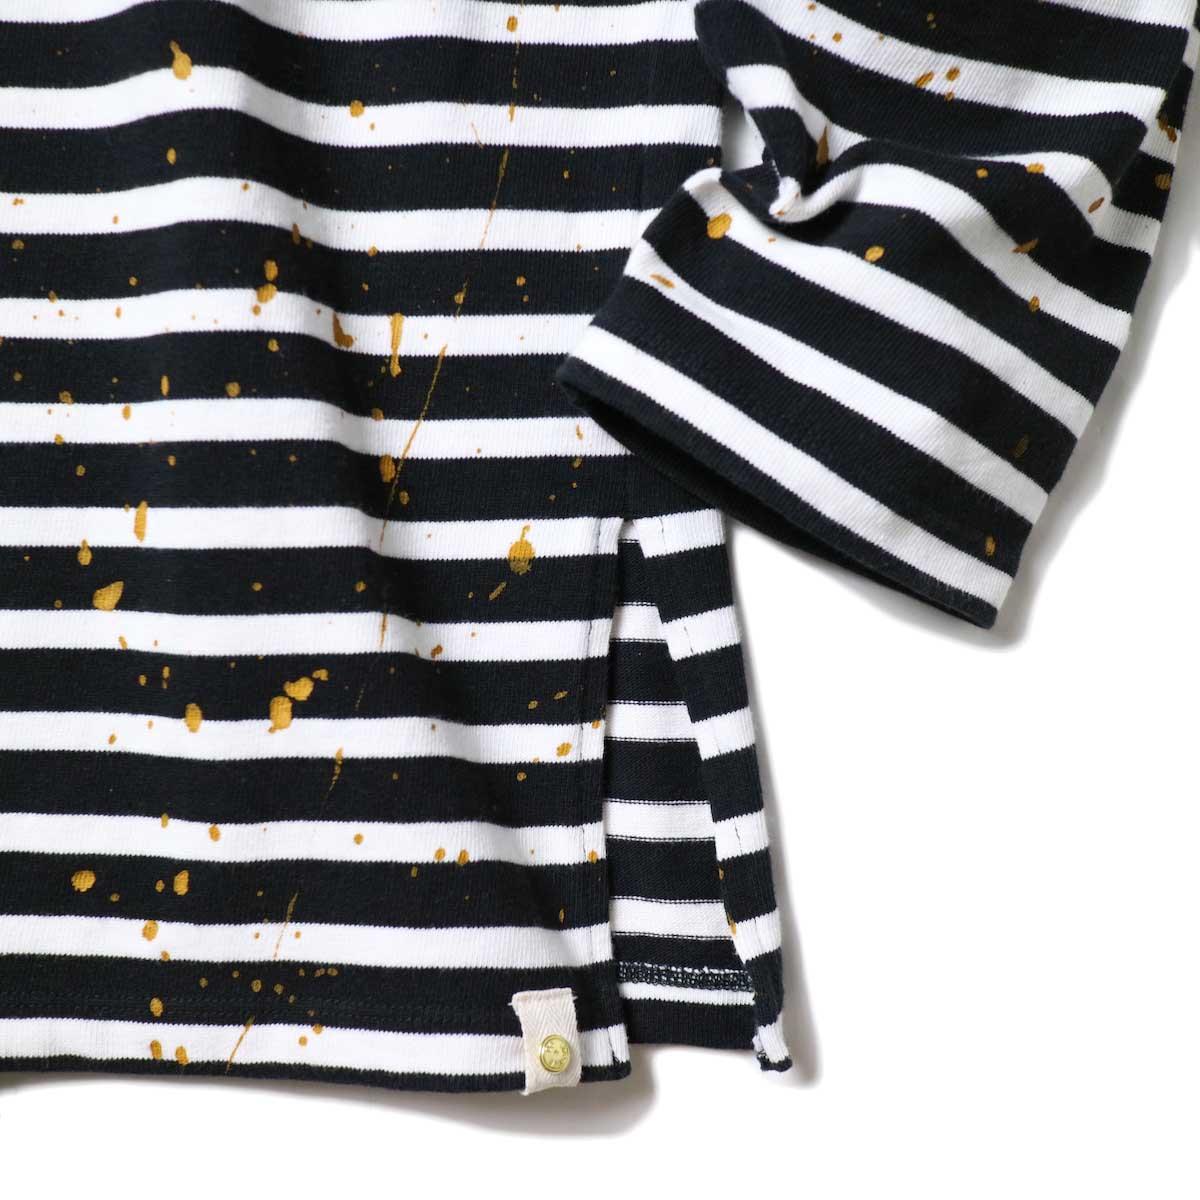 MASTER&Co. / BASQUE BORDER WITH PAINT (Black×White) 袖・裾スリット